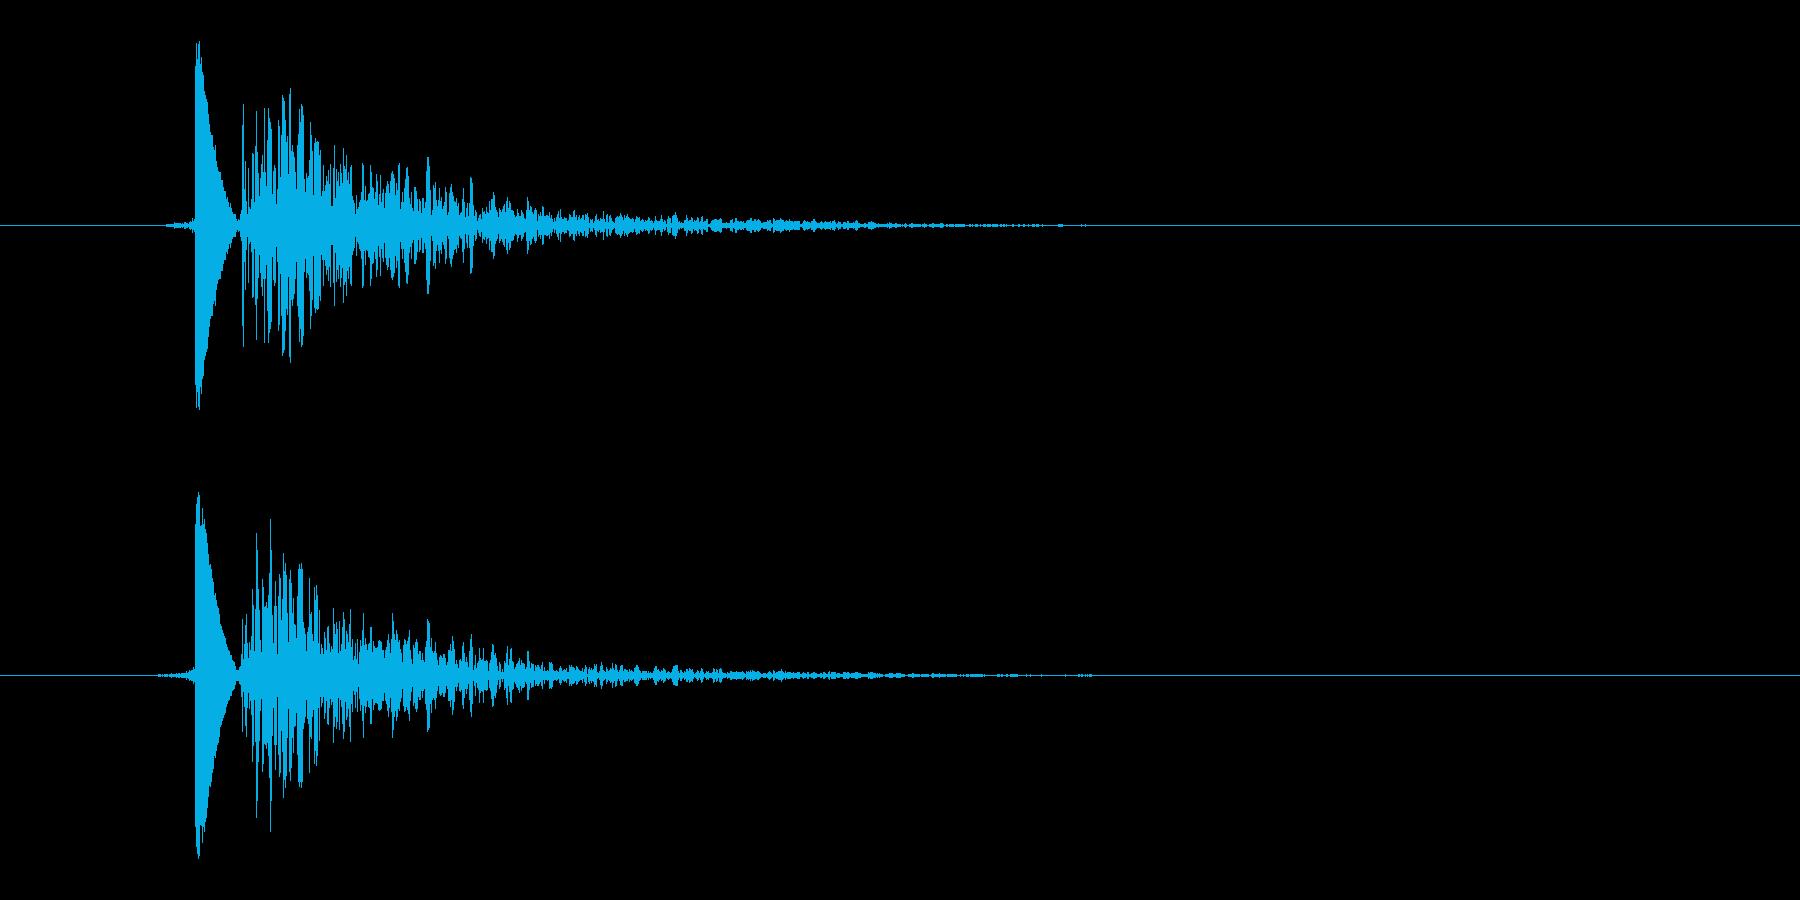 風船破裂音(パンッ!!) 著作権フリー音源・音楽素材 [mp3/WAV ...